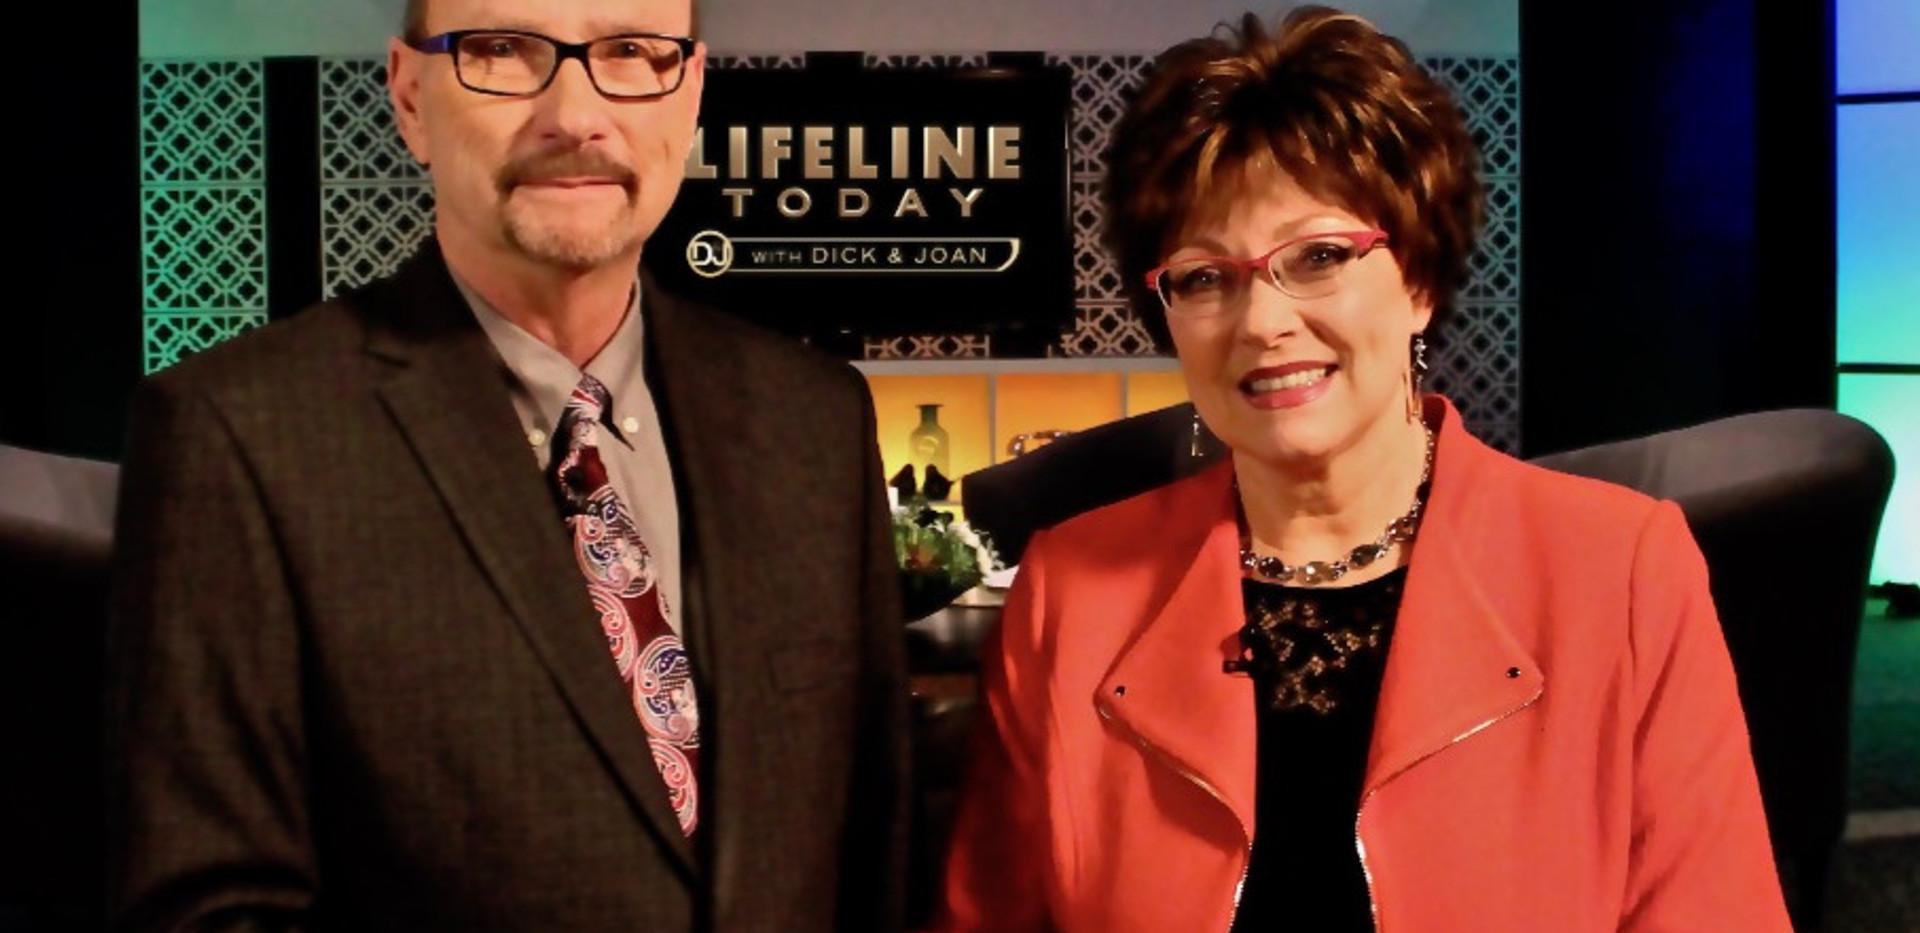 LIFELINE TODAY | Season 6, Episode 187